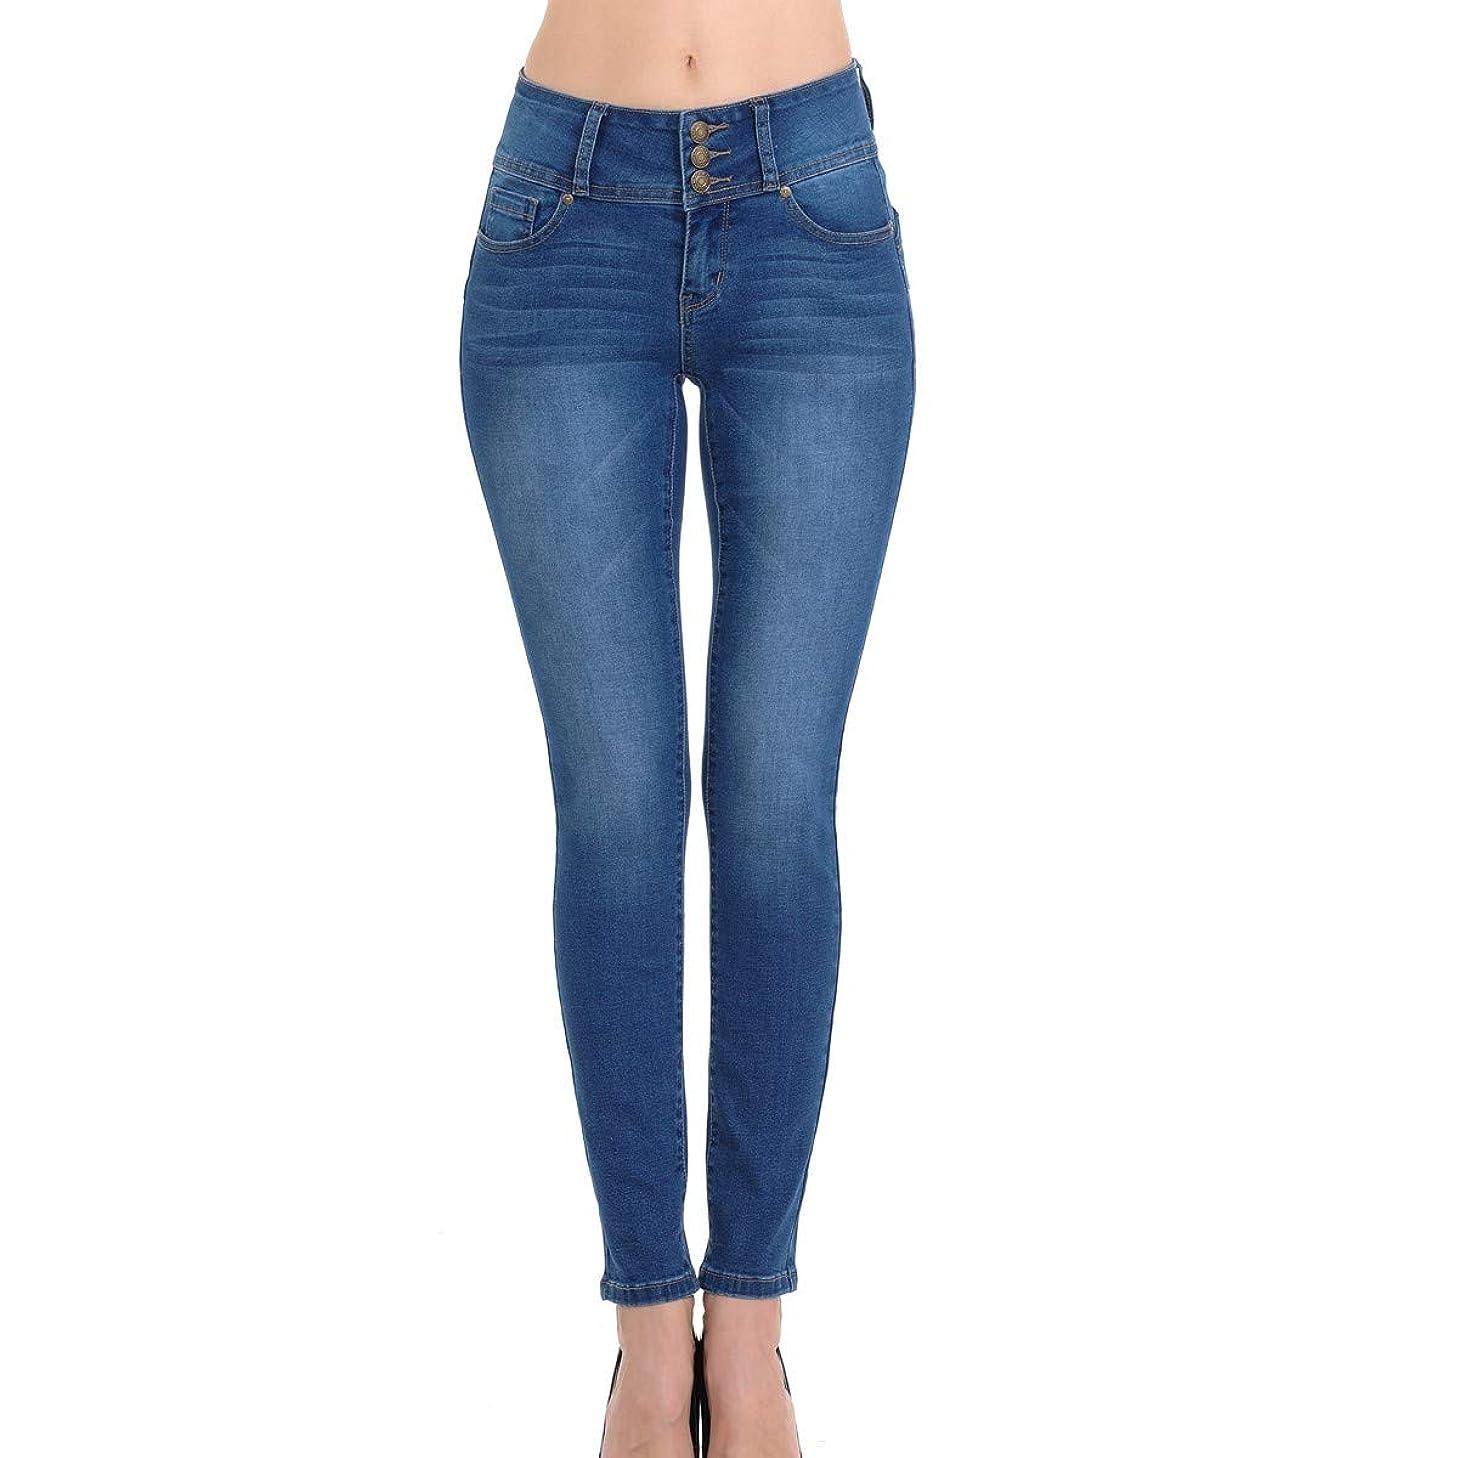 Wax Women's Juniors Body Flattering Mid Rise Skinny Jeans